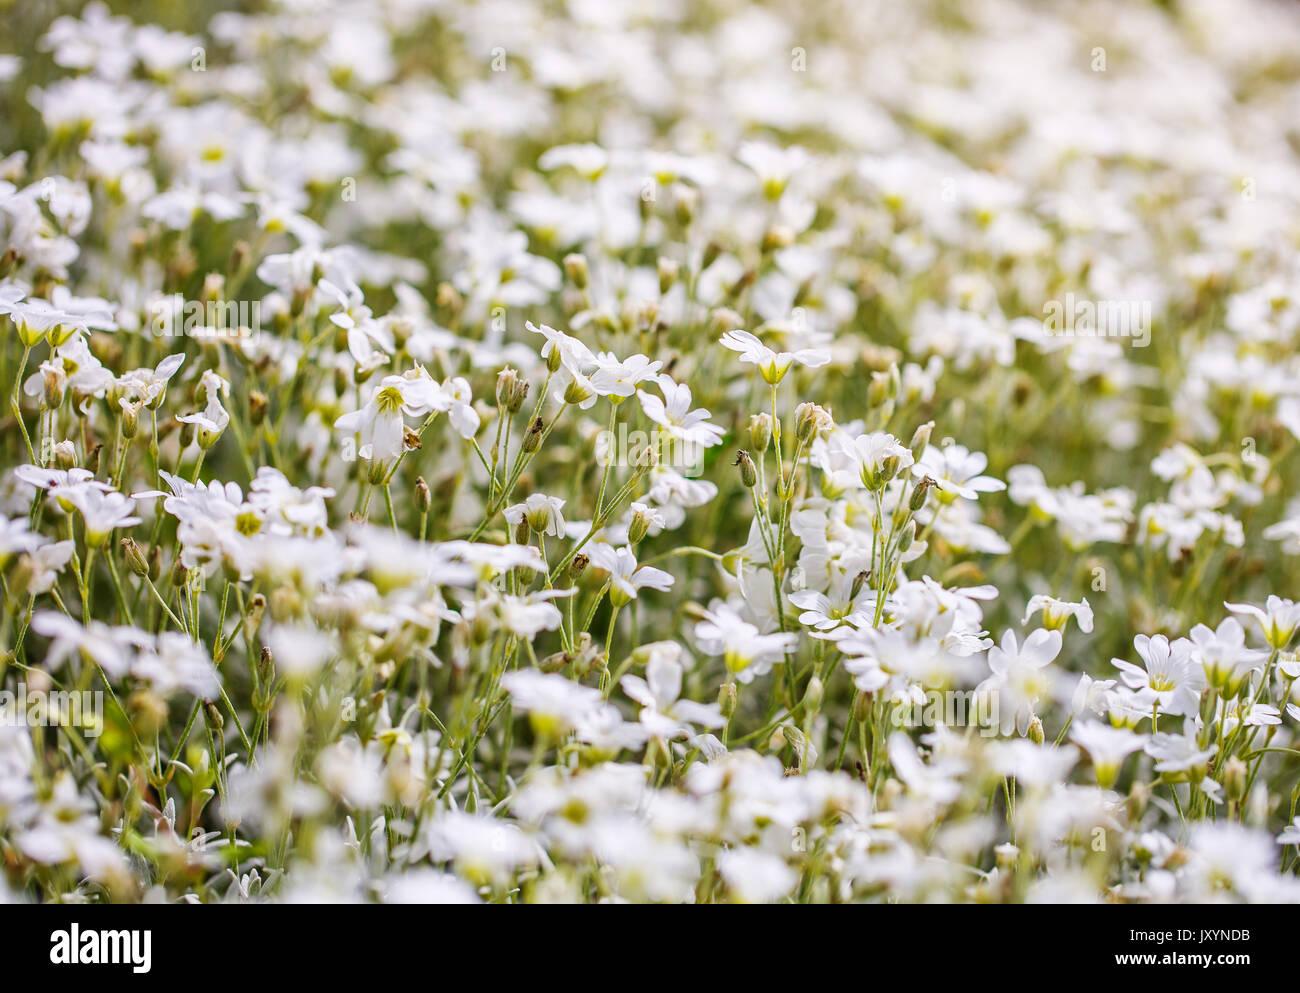 Field of a beautiful white flowers daisies stock photo 154273543 field of a beautiful white flowers daisies mightylinksfo